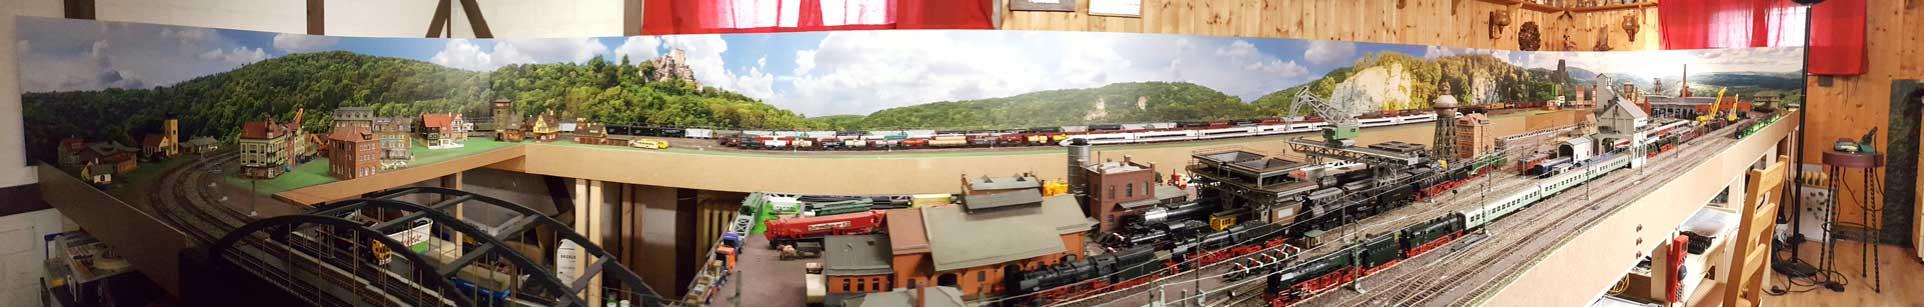 modellbahn-hintergrund-von-modellbahning-christian-toelg-003 3